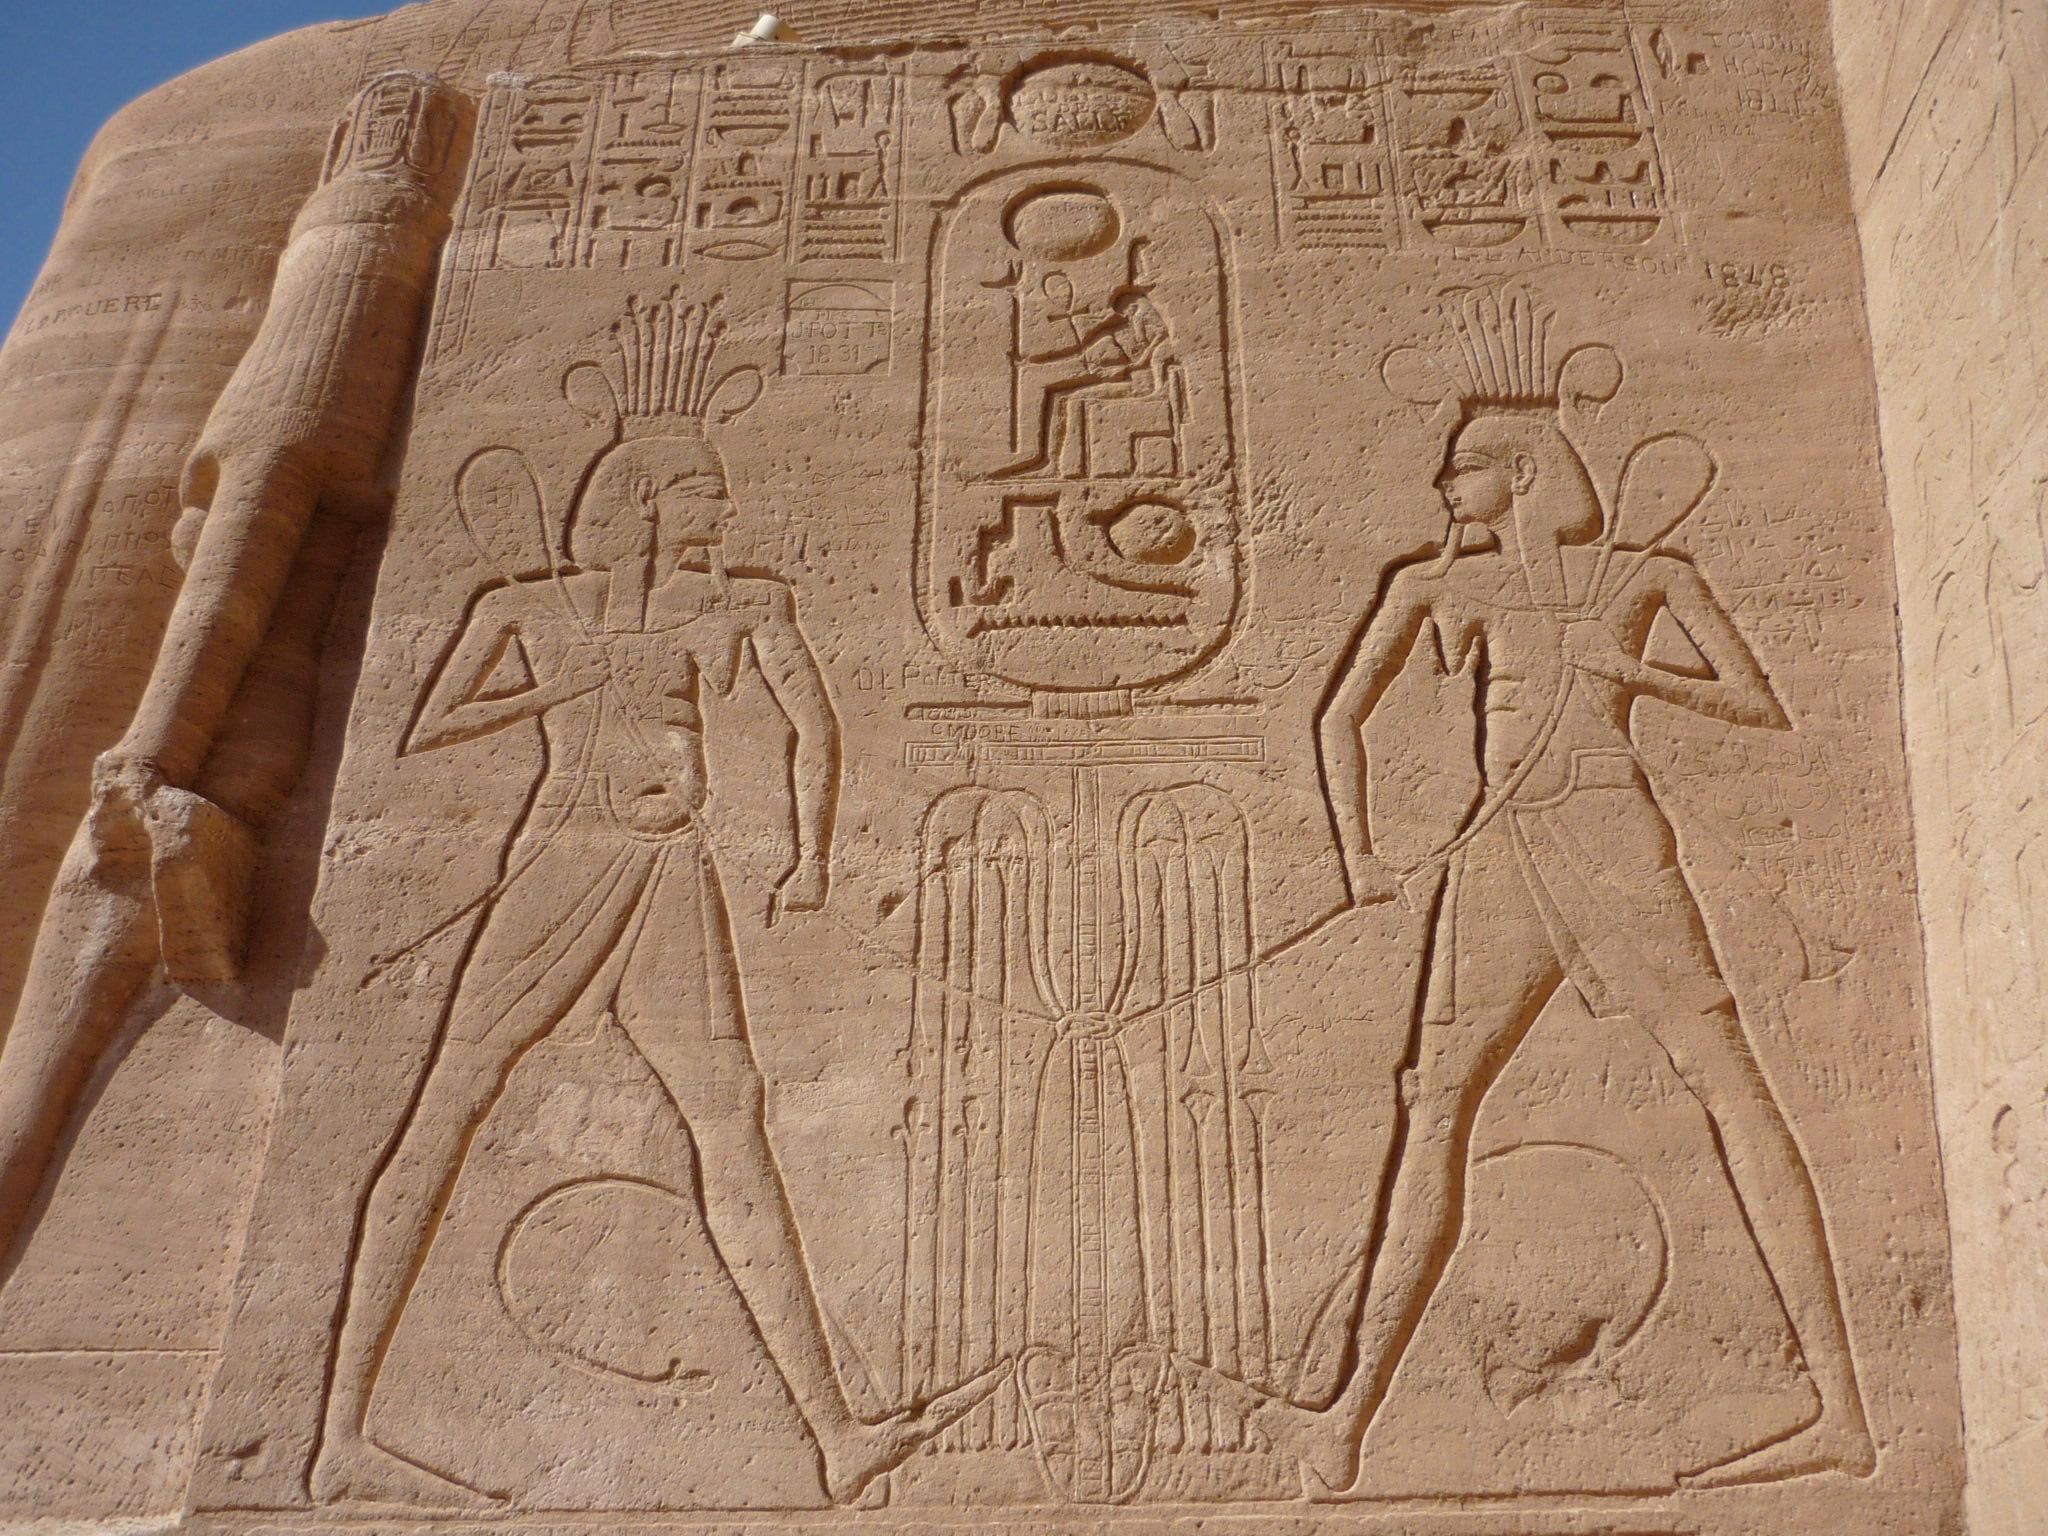 http://upload.wikimedia.org/wikipedia/commons/d/dd/H%C3%A2py_Sema-Taouy_Abou_Simbel.JPG